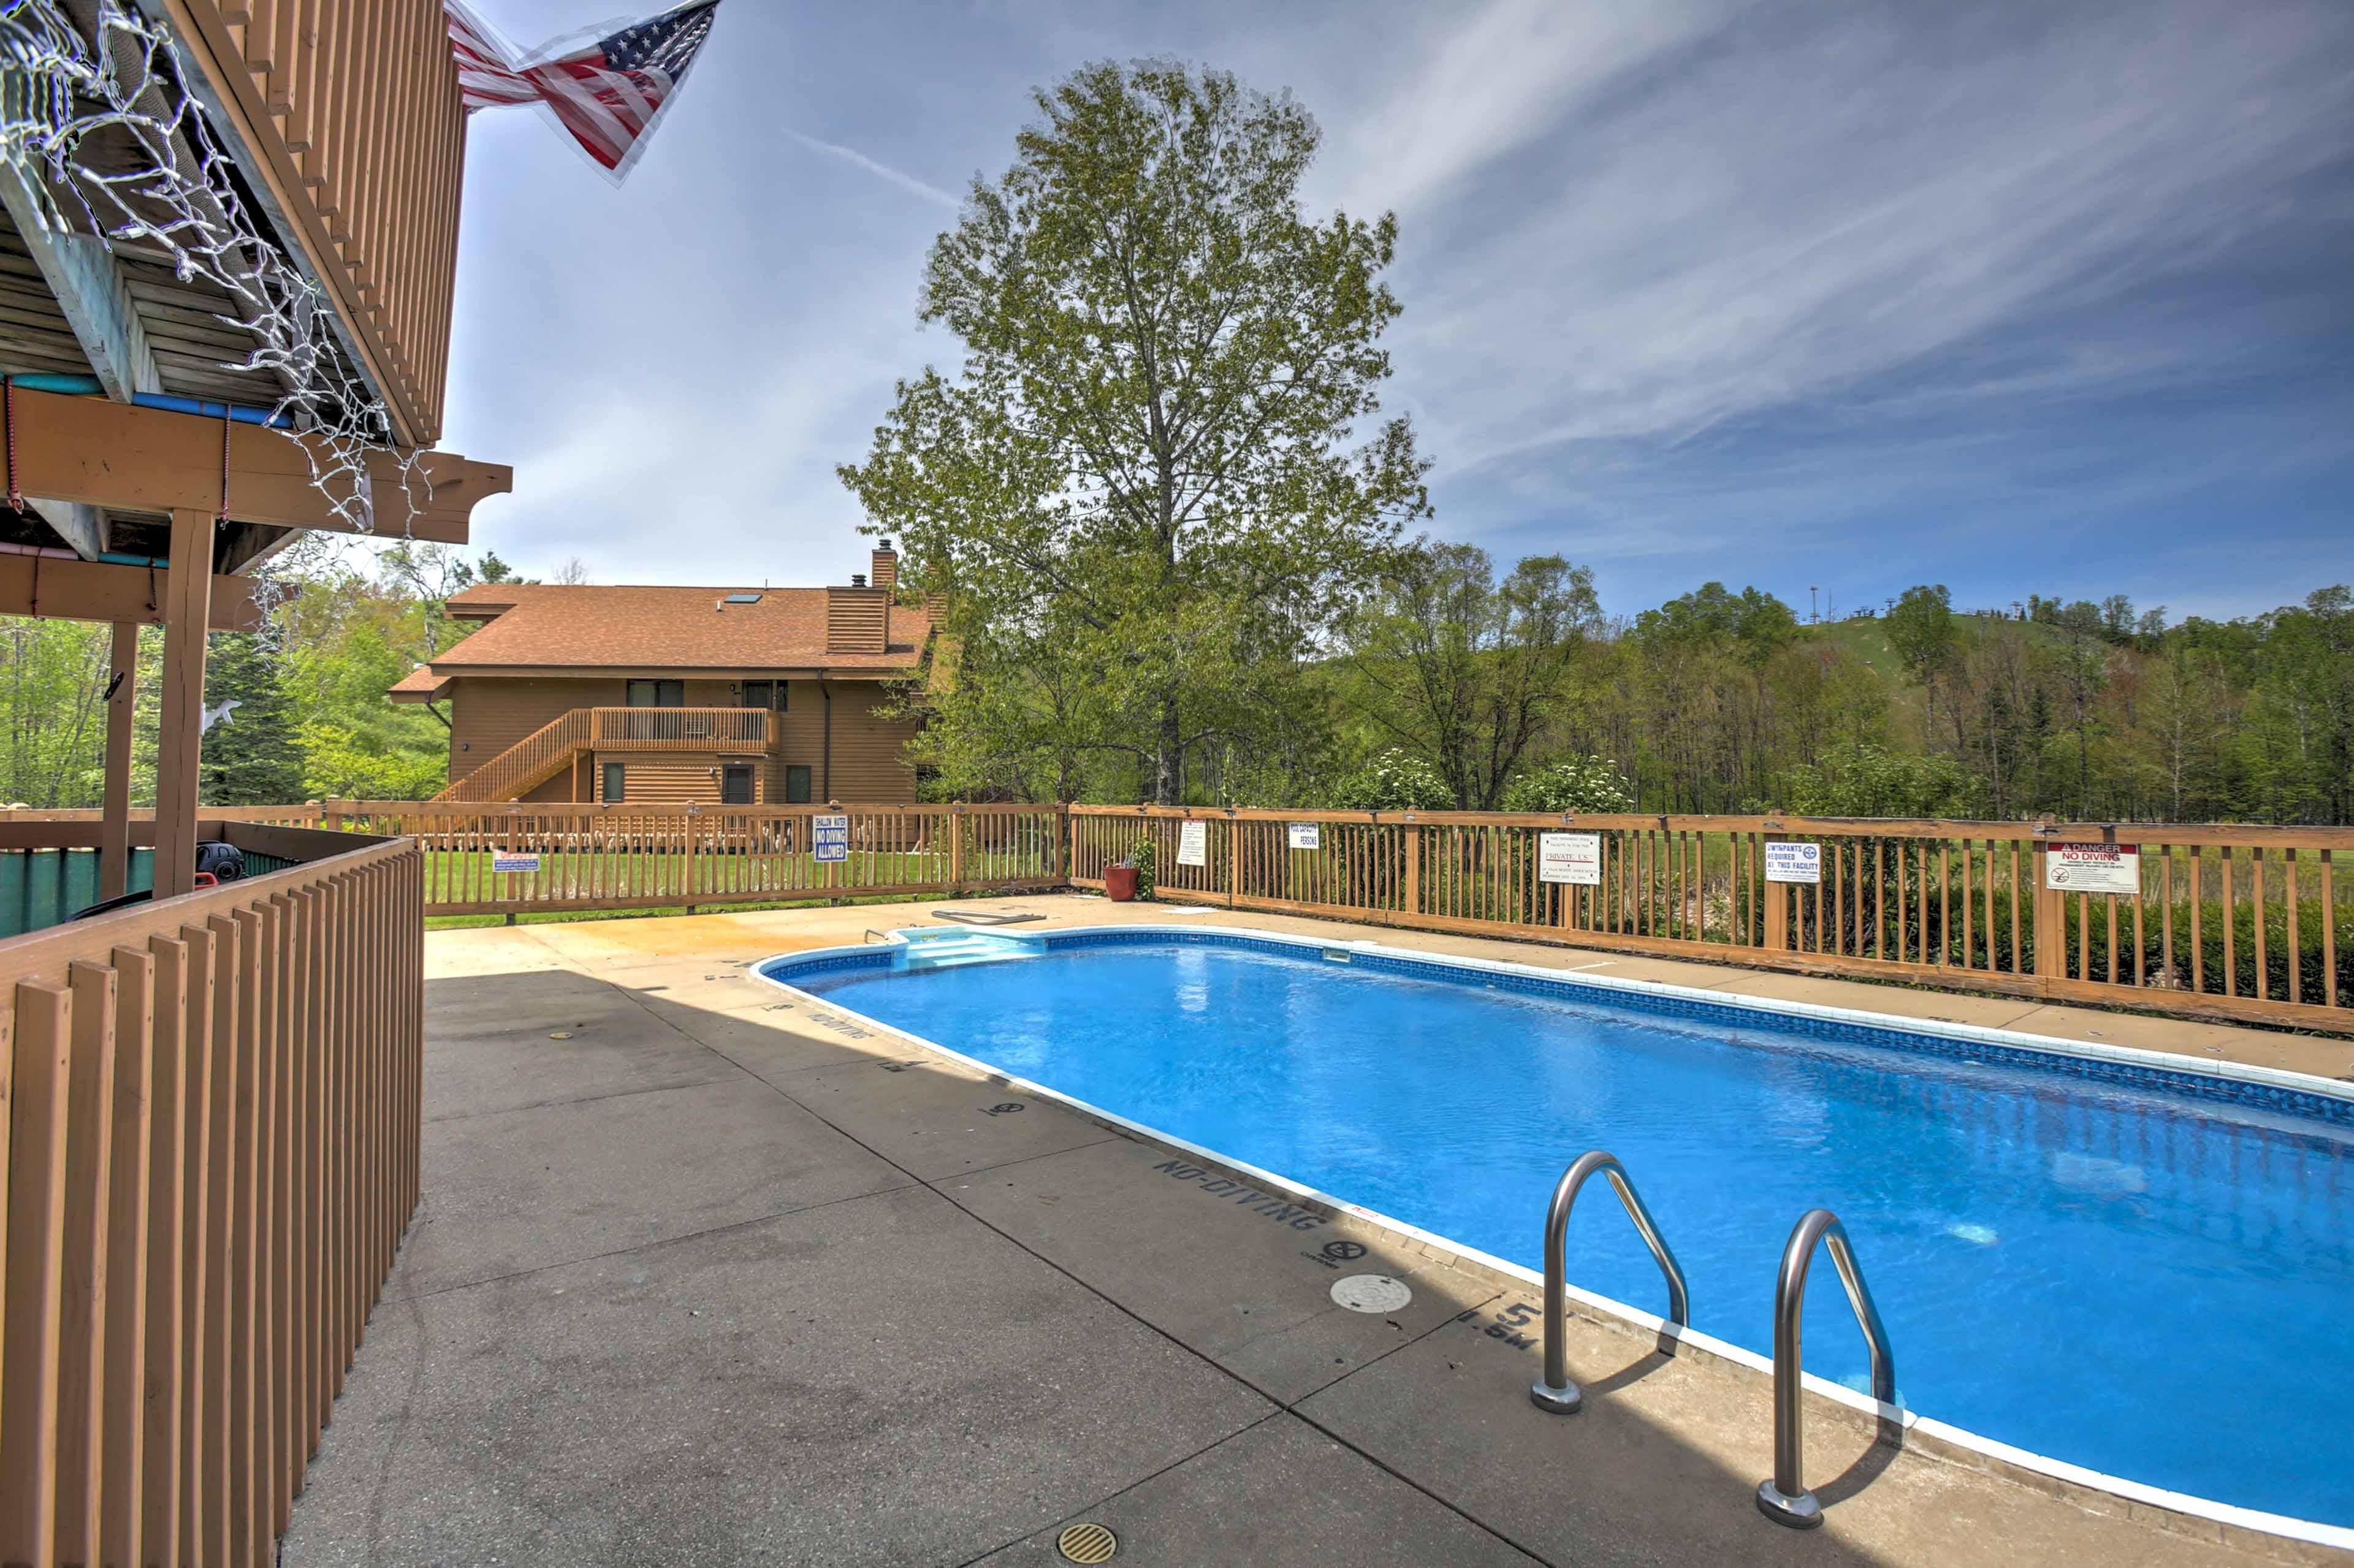 Take advantage of the seasonal resort amenities located around the complex.